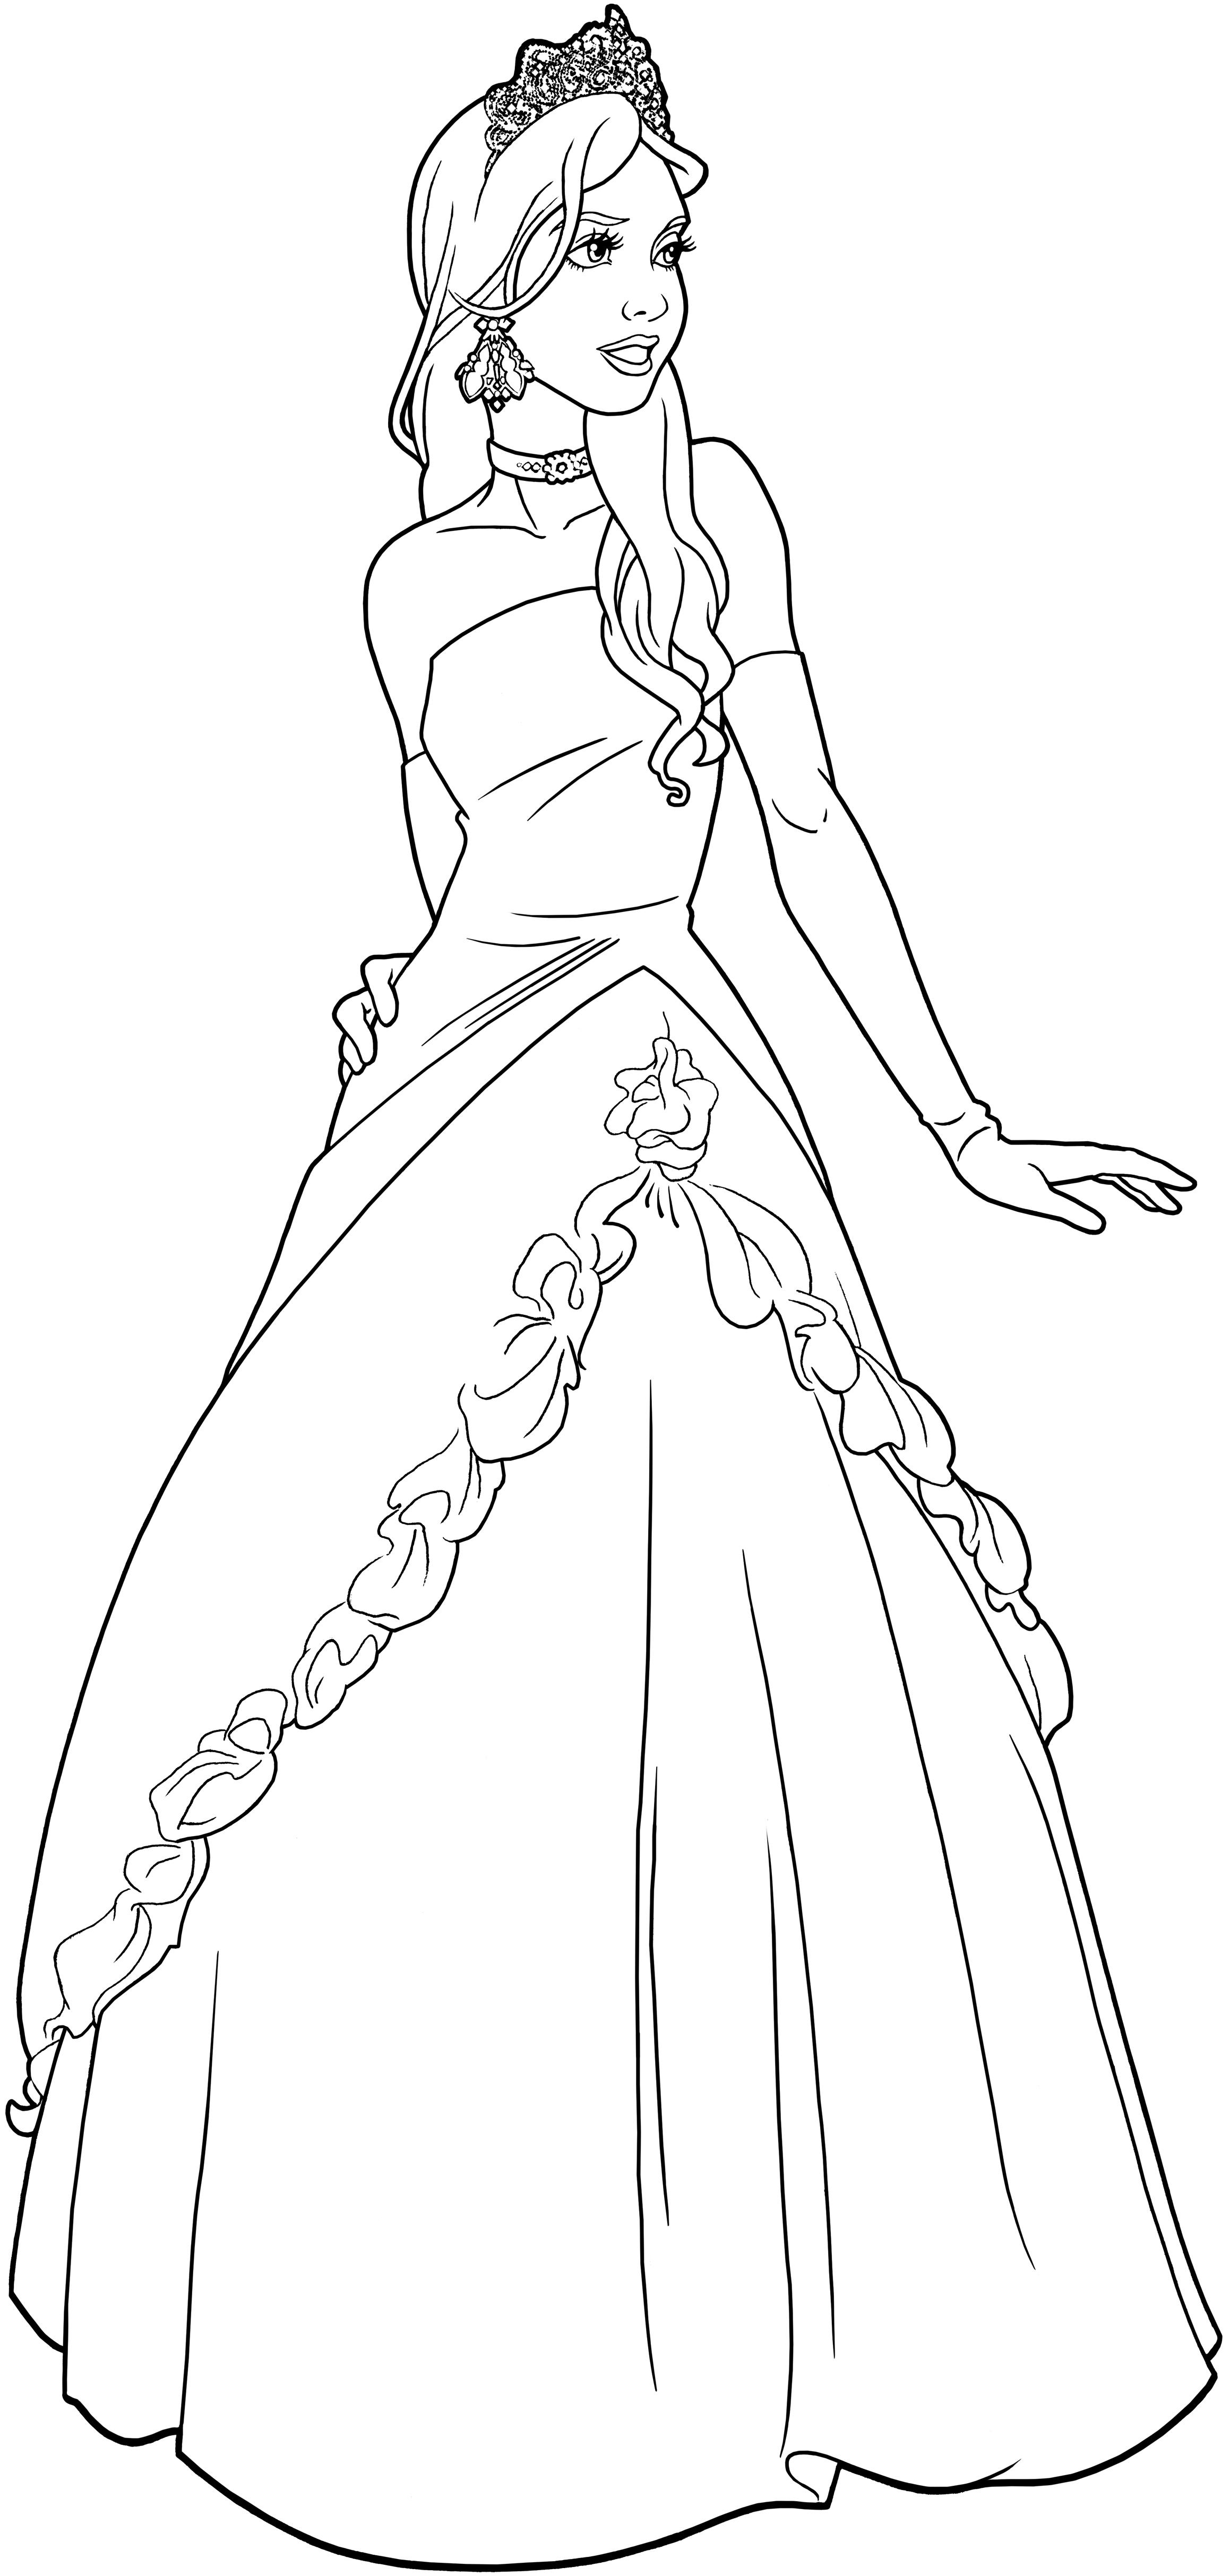 2317x4853 Pencil Sketch Of Princess Easy Easy Pencil Drawings Of Princess